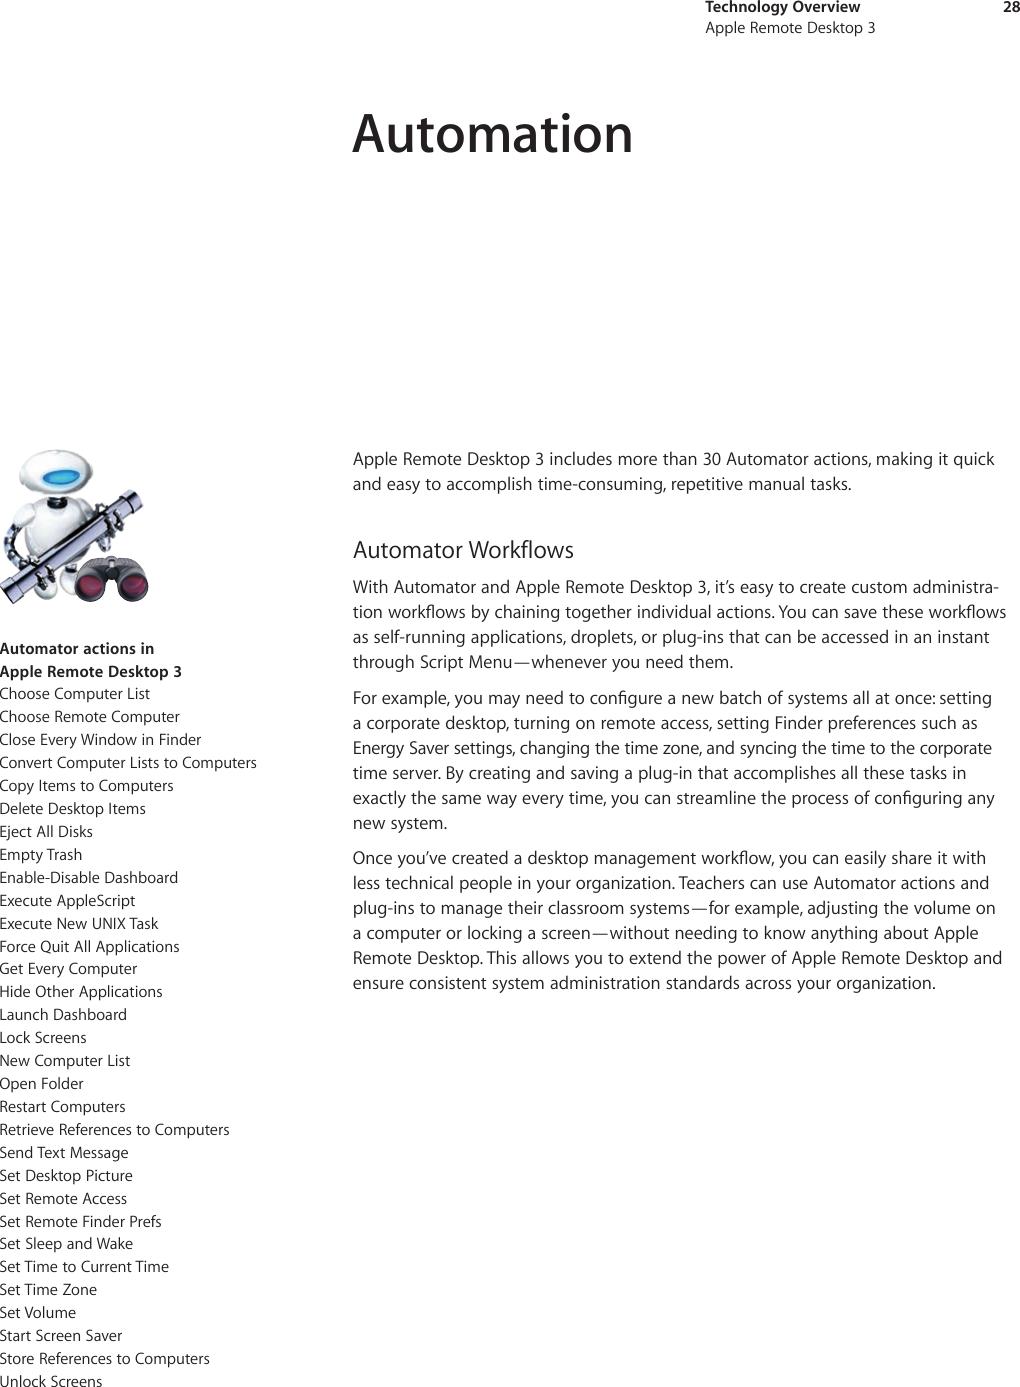 Apple AppleRemoteDesktop3 X Remote Desktop 3 Technical